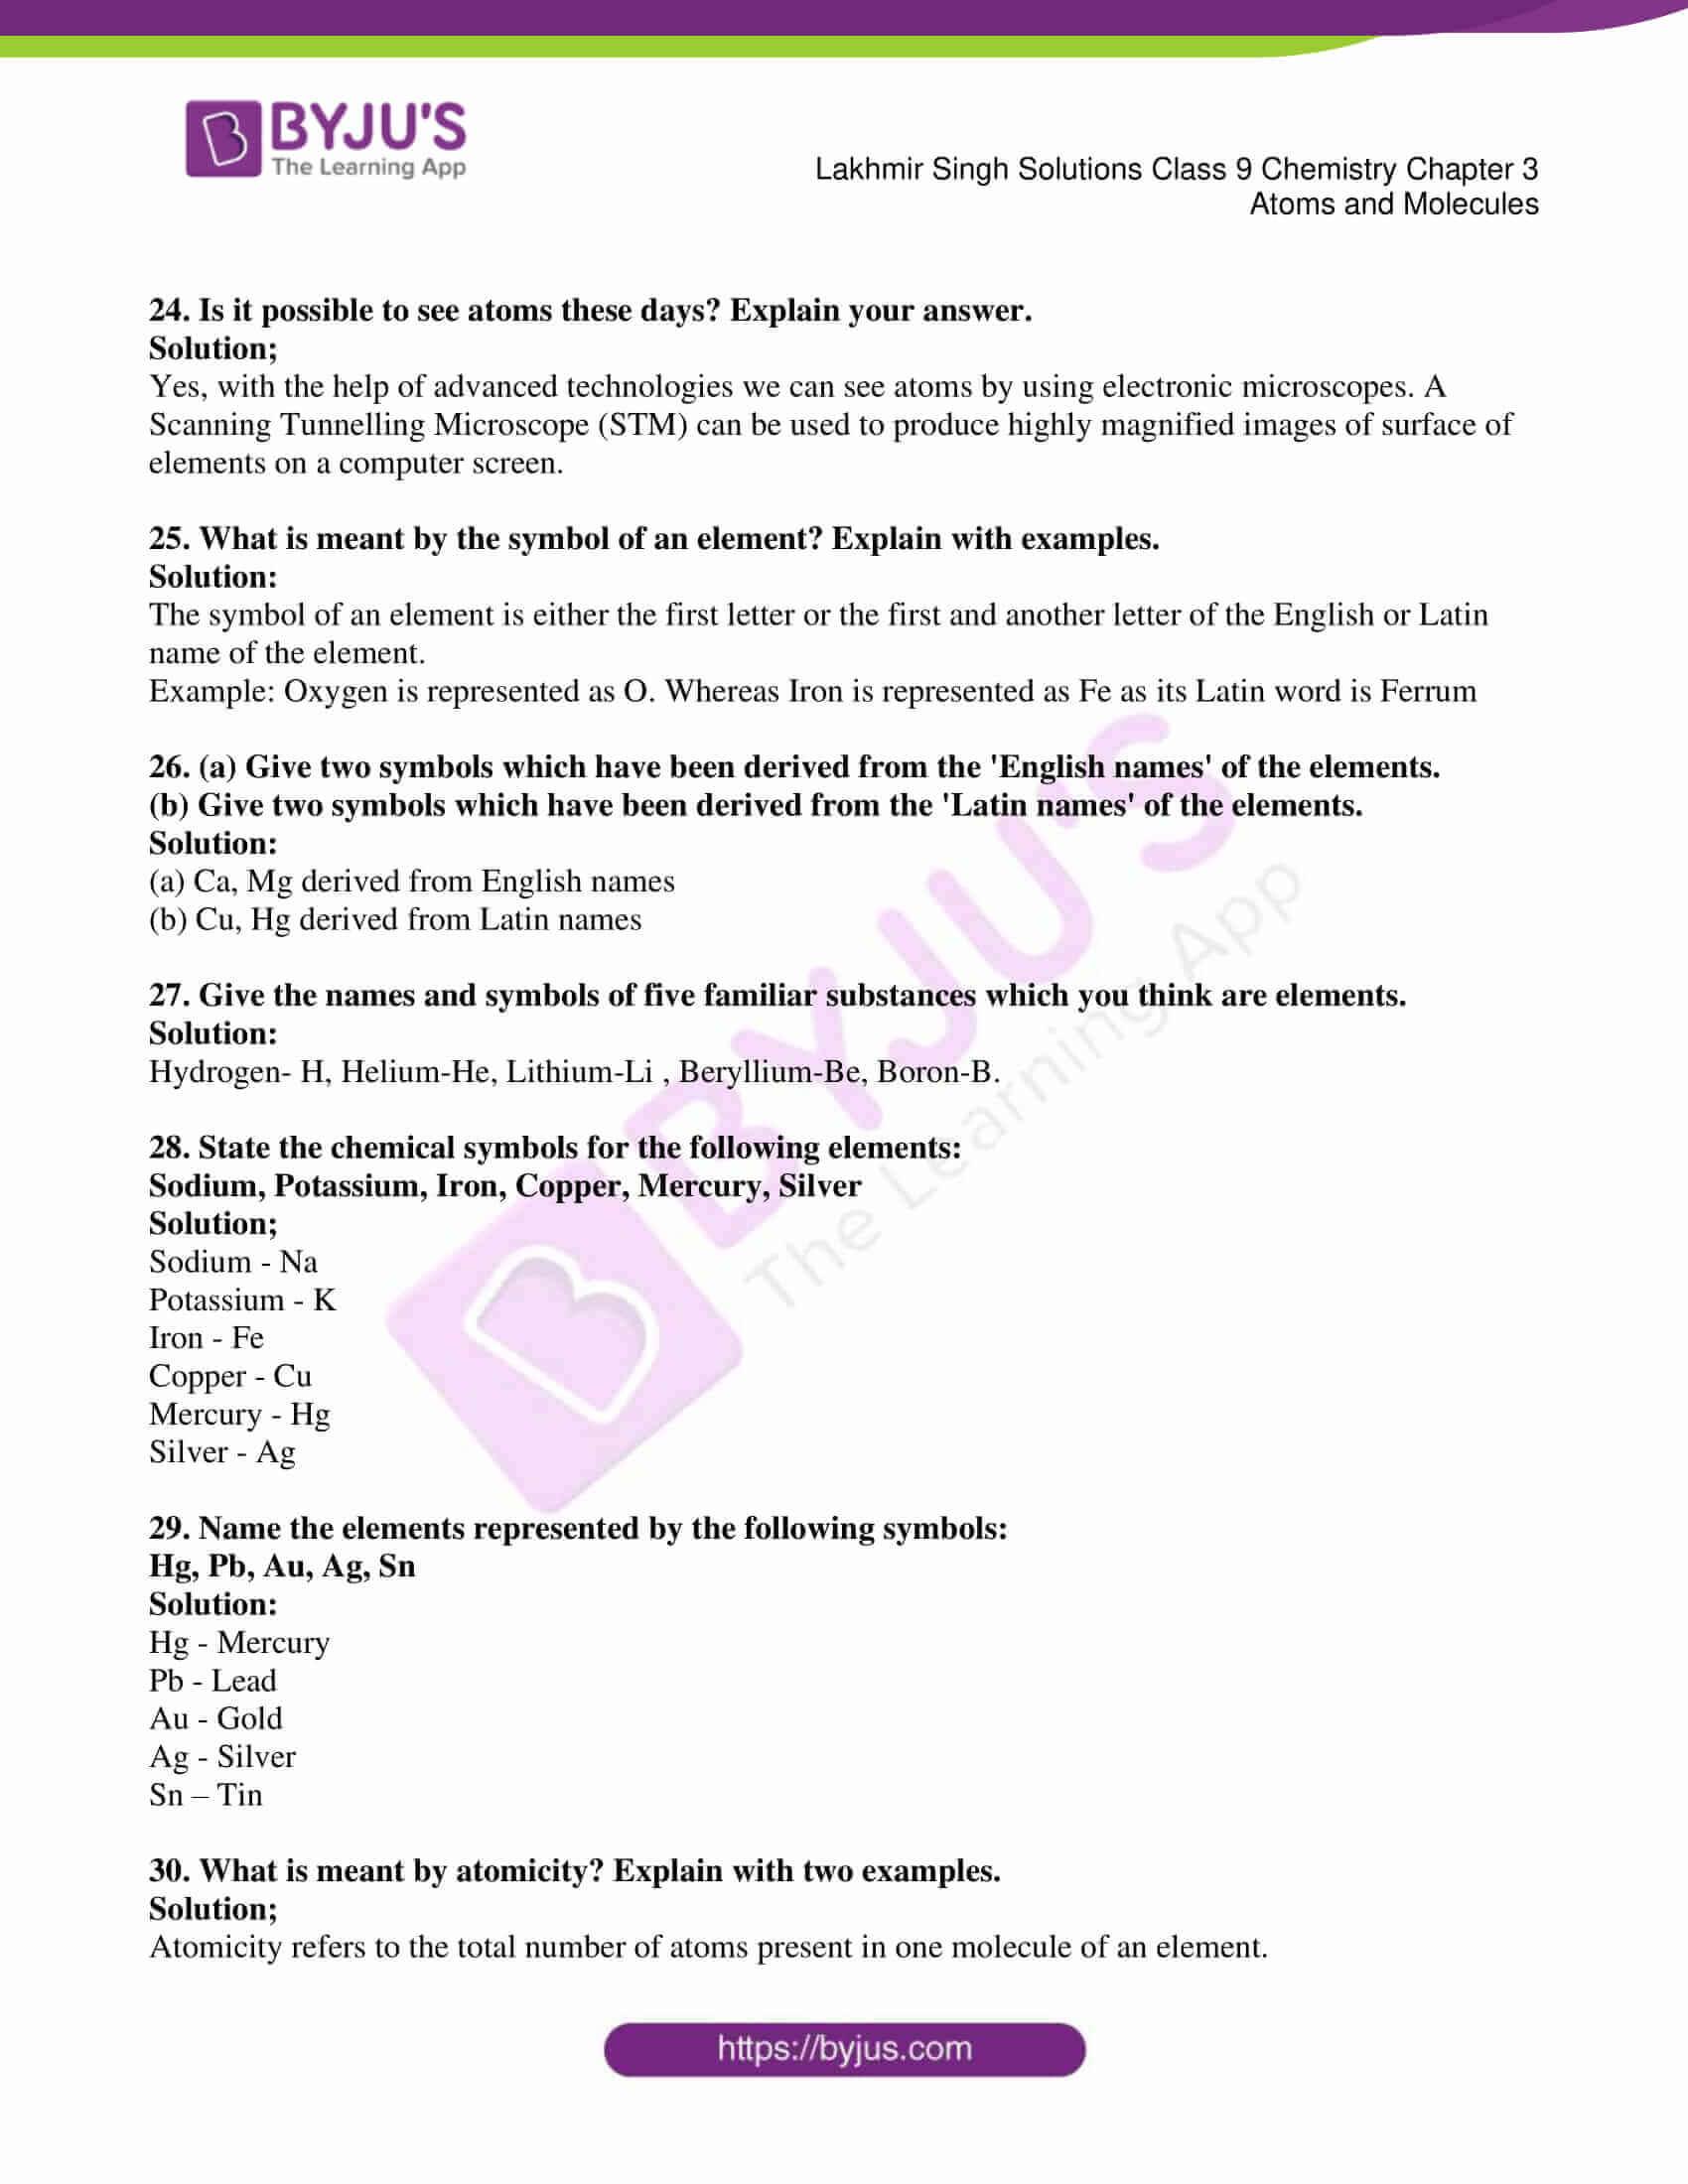 lakhmir singh solutions class 9 chemistry chapter 3 04